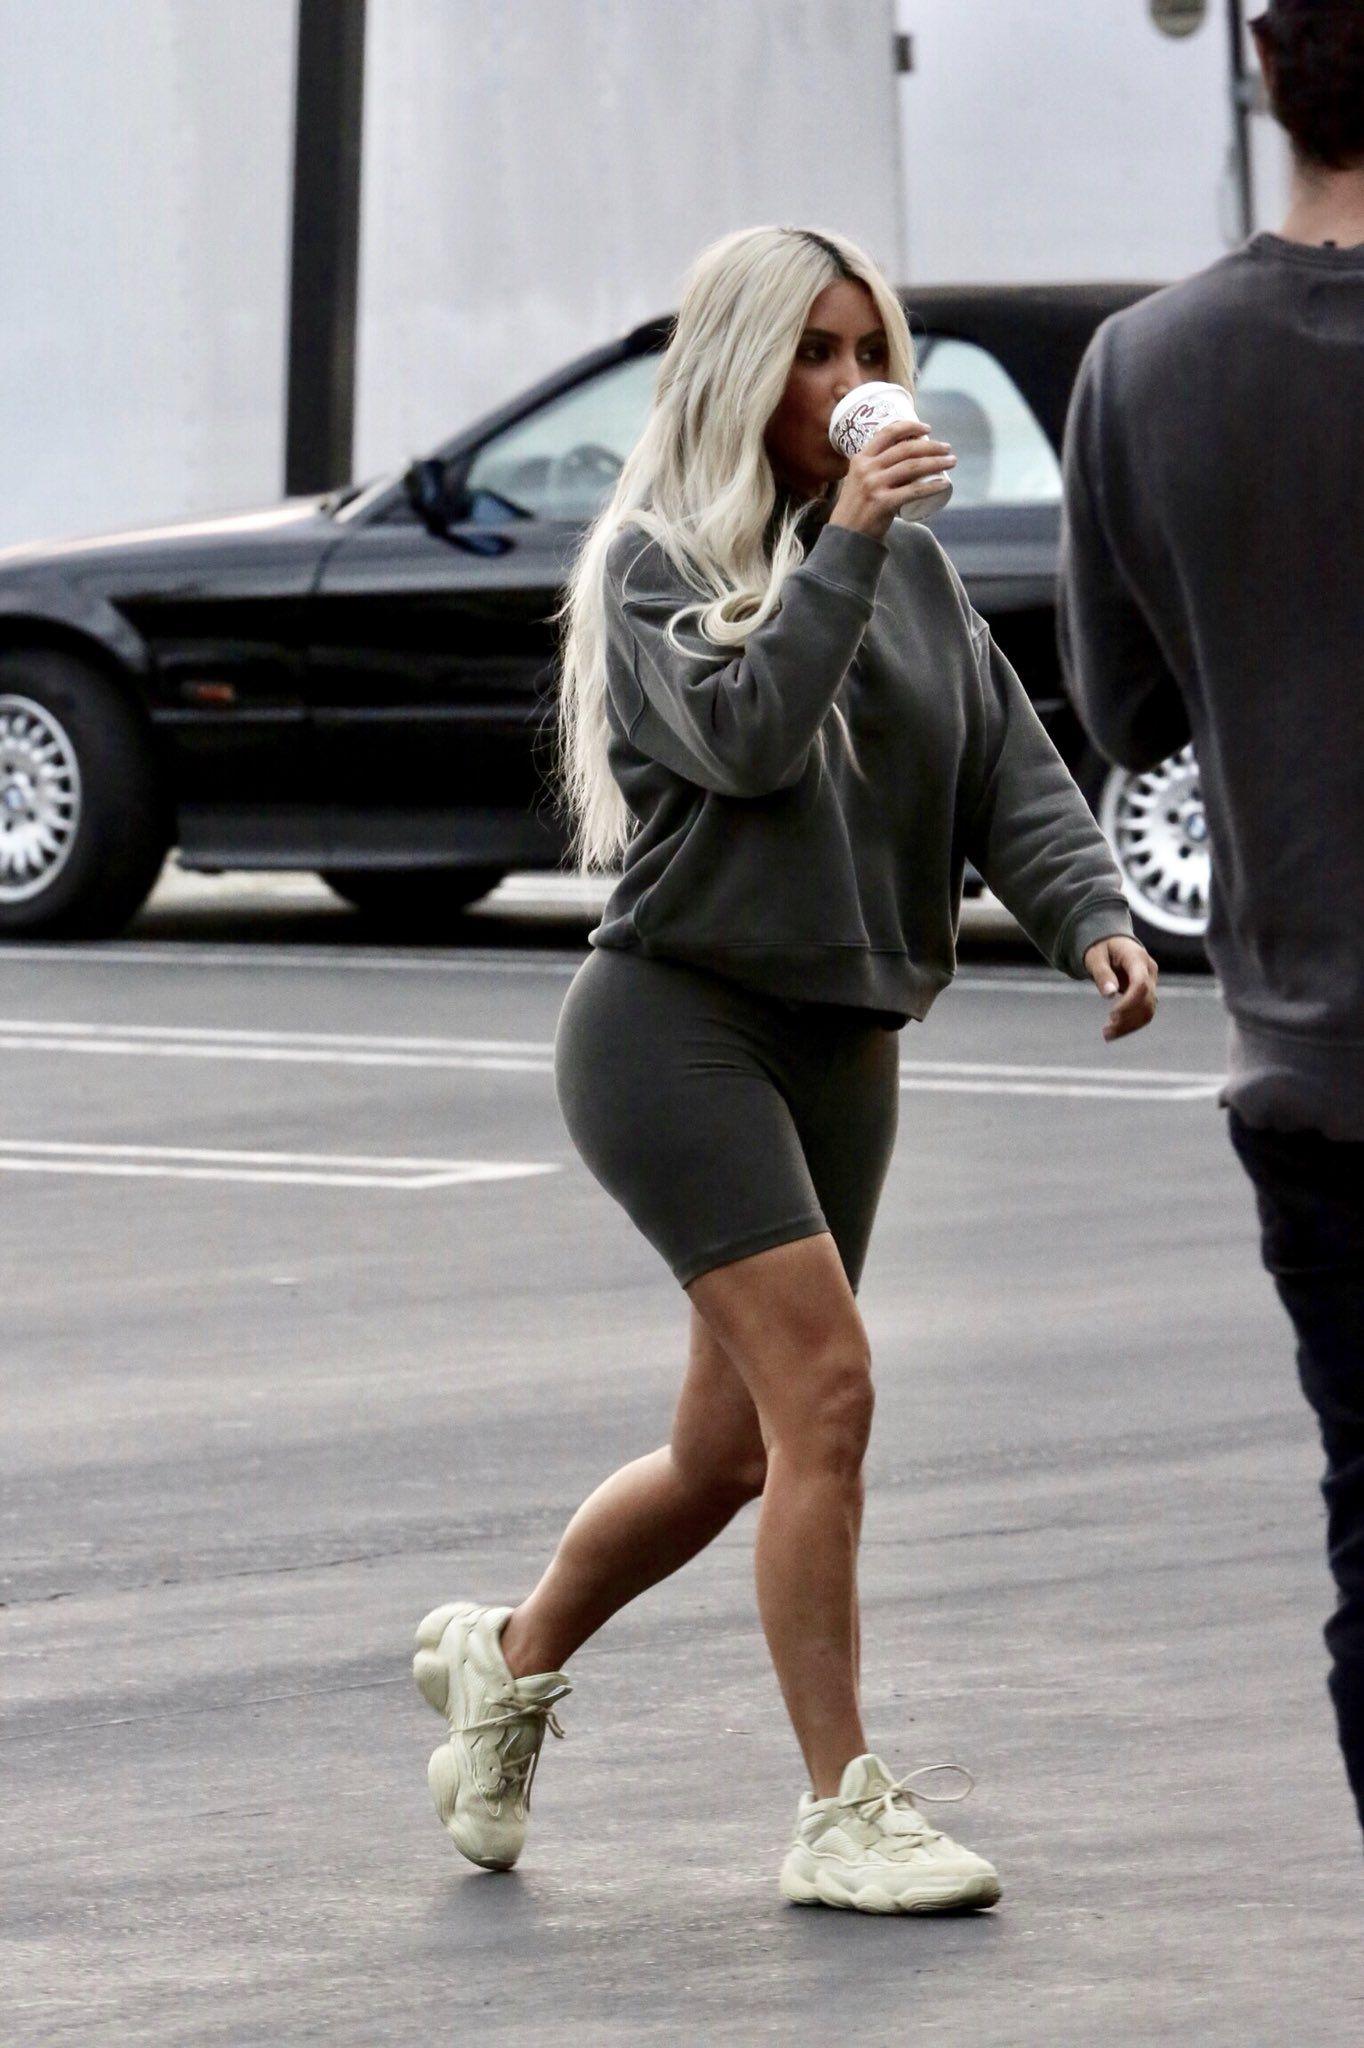 Kim Kardashian in Hoodie and Biker Shorts - Kim Kardashian